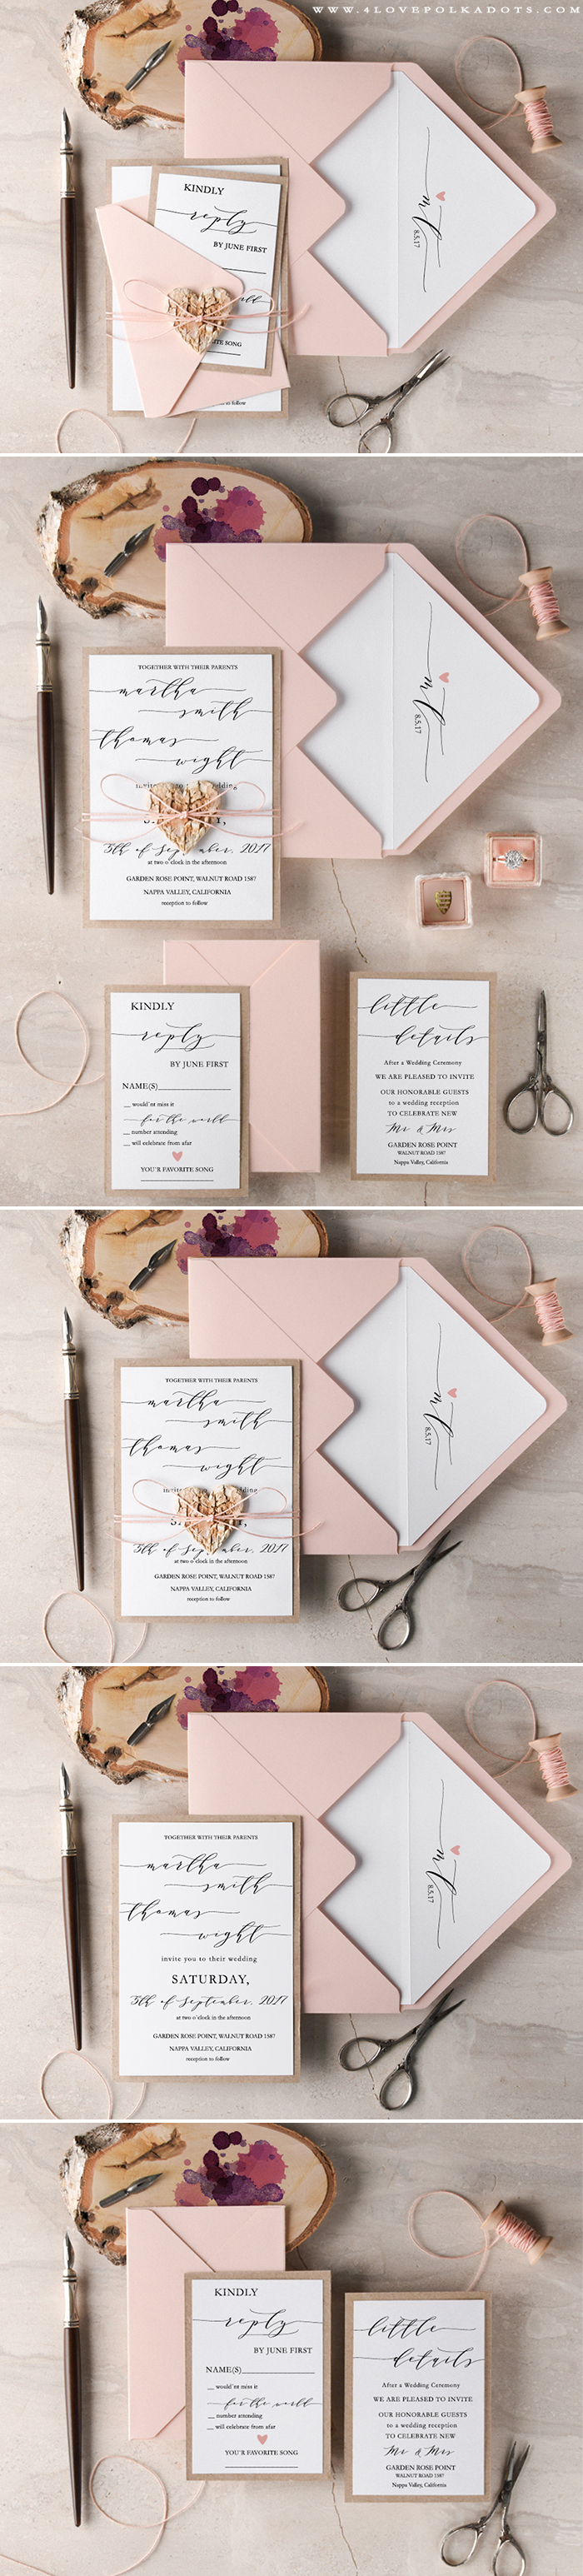 Wedding Invitations - Calligraphy writing, real birch bark heart tag ...